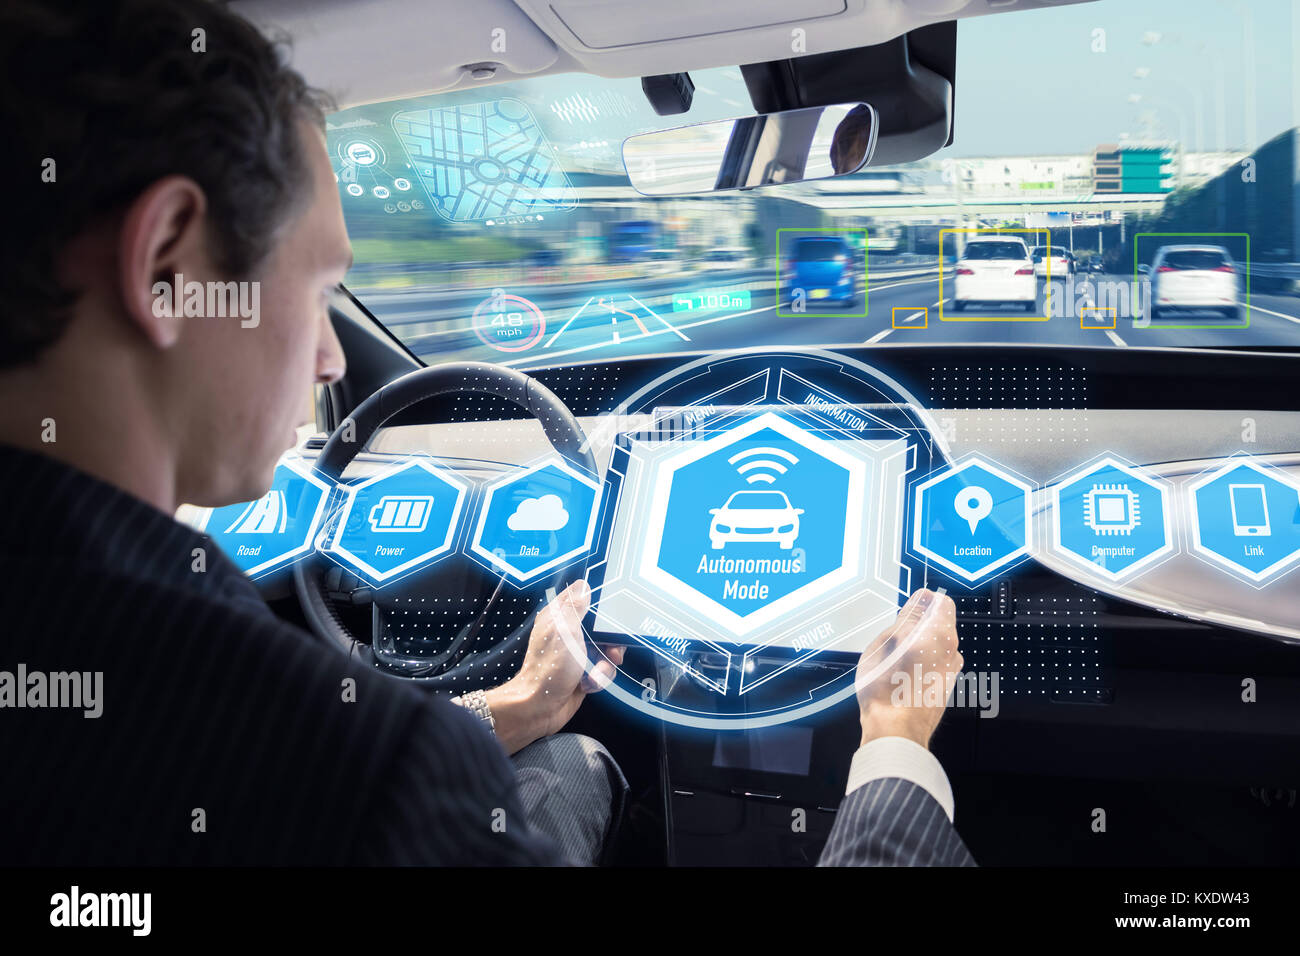 Caucasian man riding autonomous car. Self driving vehicle. Driverless car. - Stock Image